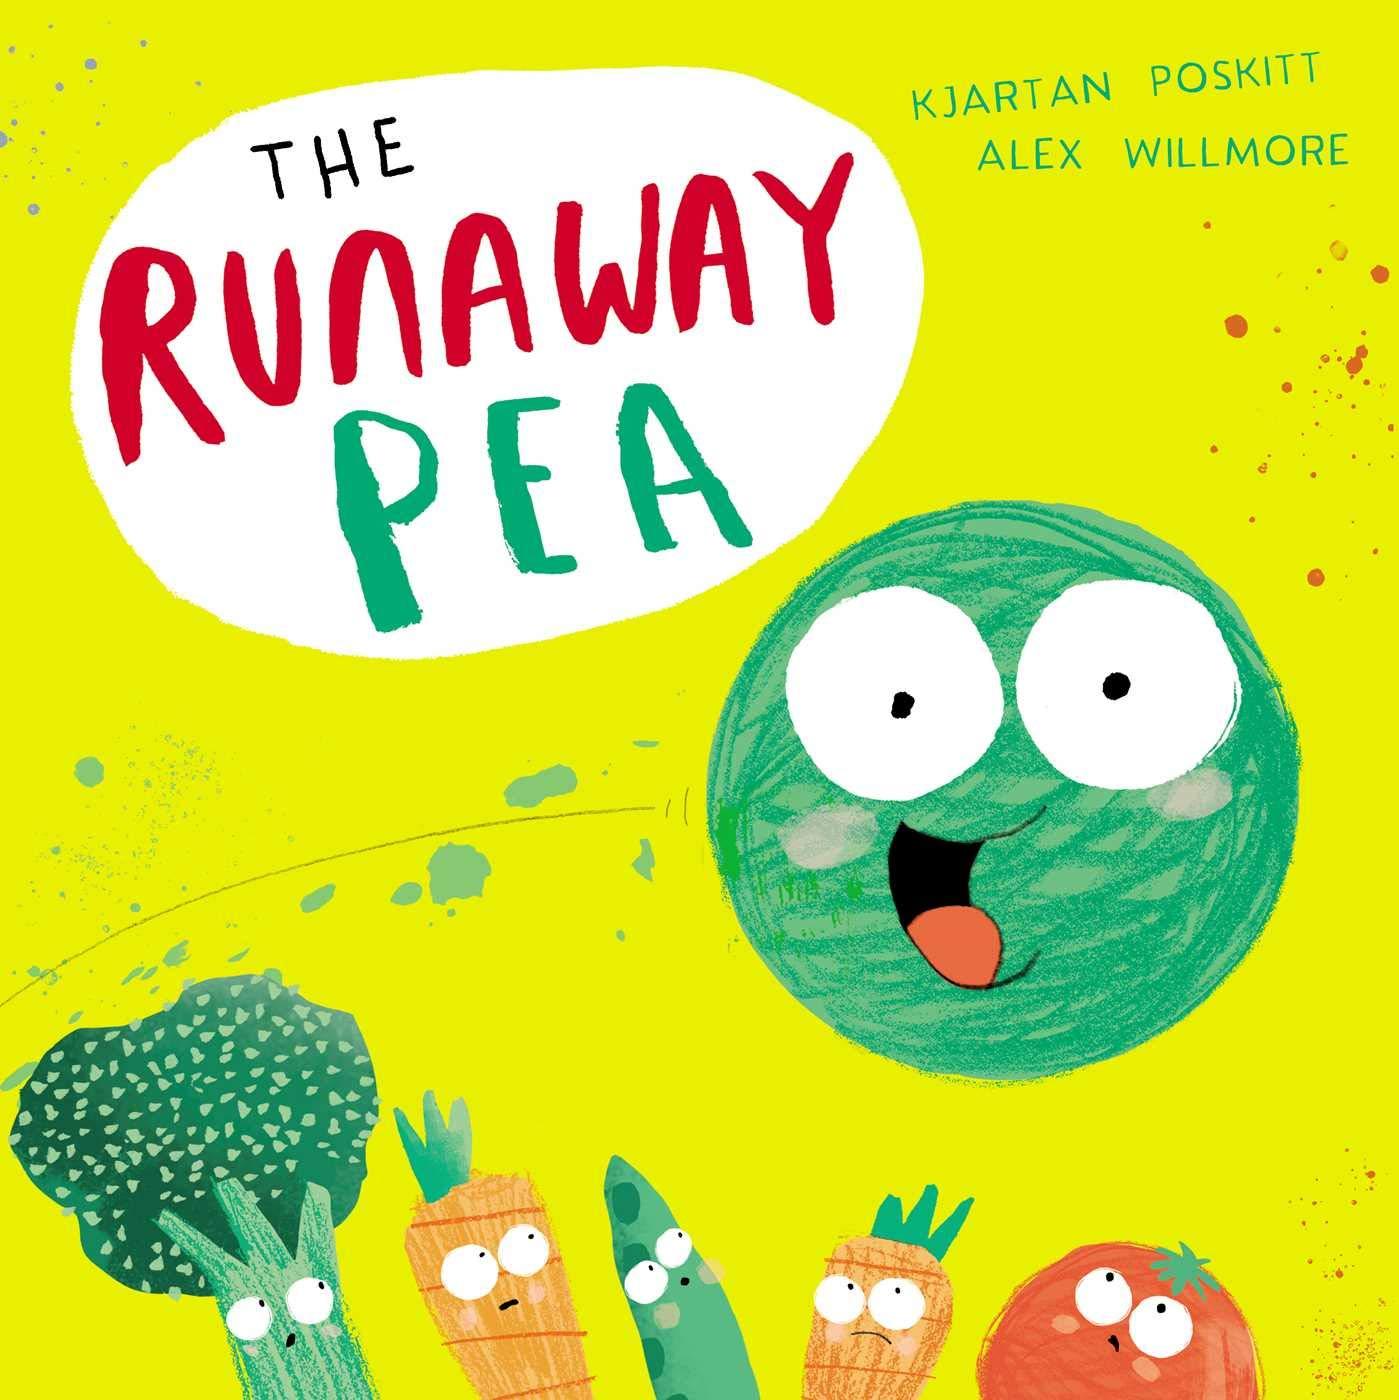 The Runaway Pea: Amazon.co.uk: Kjartan Poskitt, Alex Willmore ...